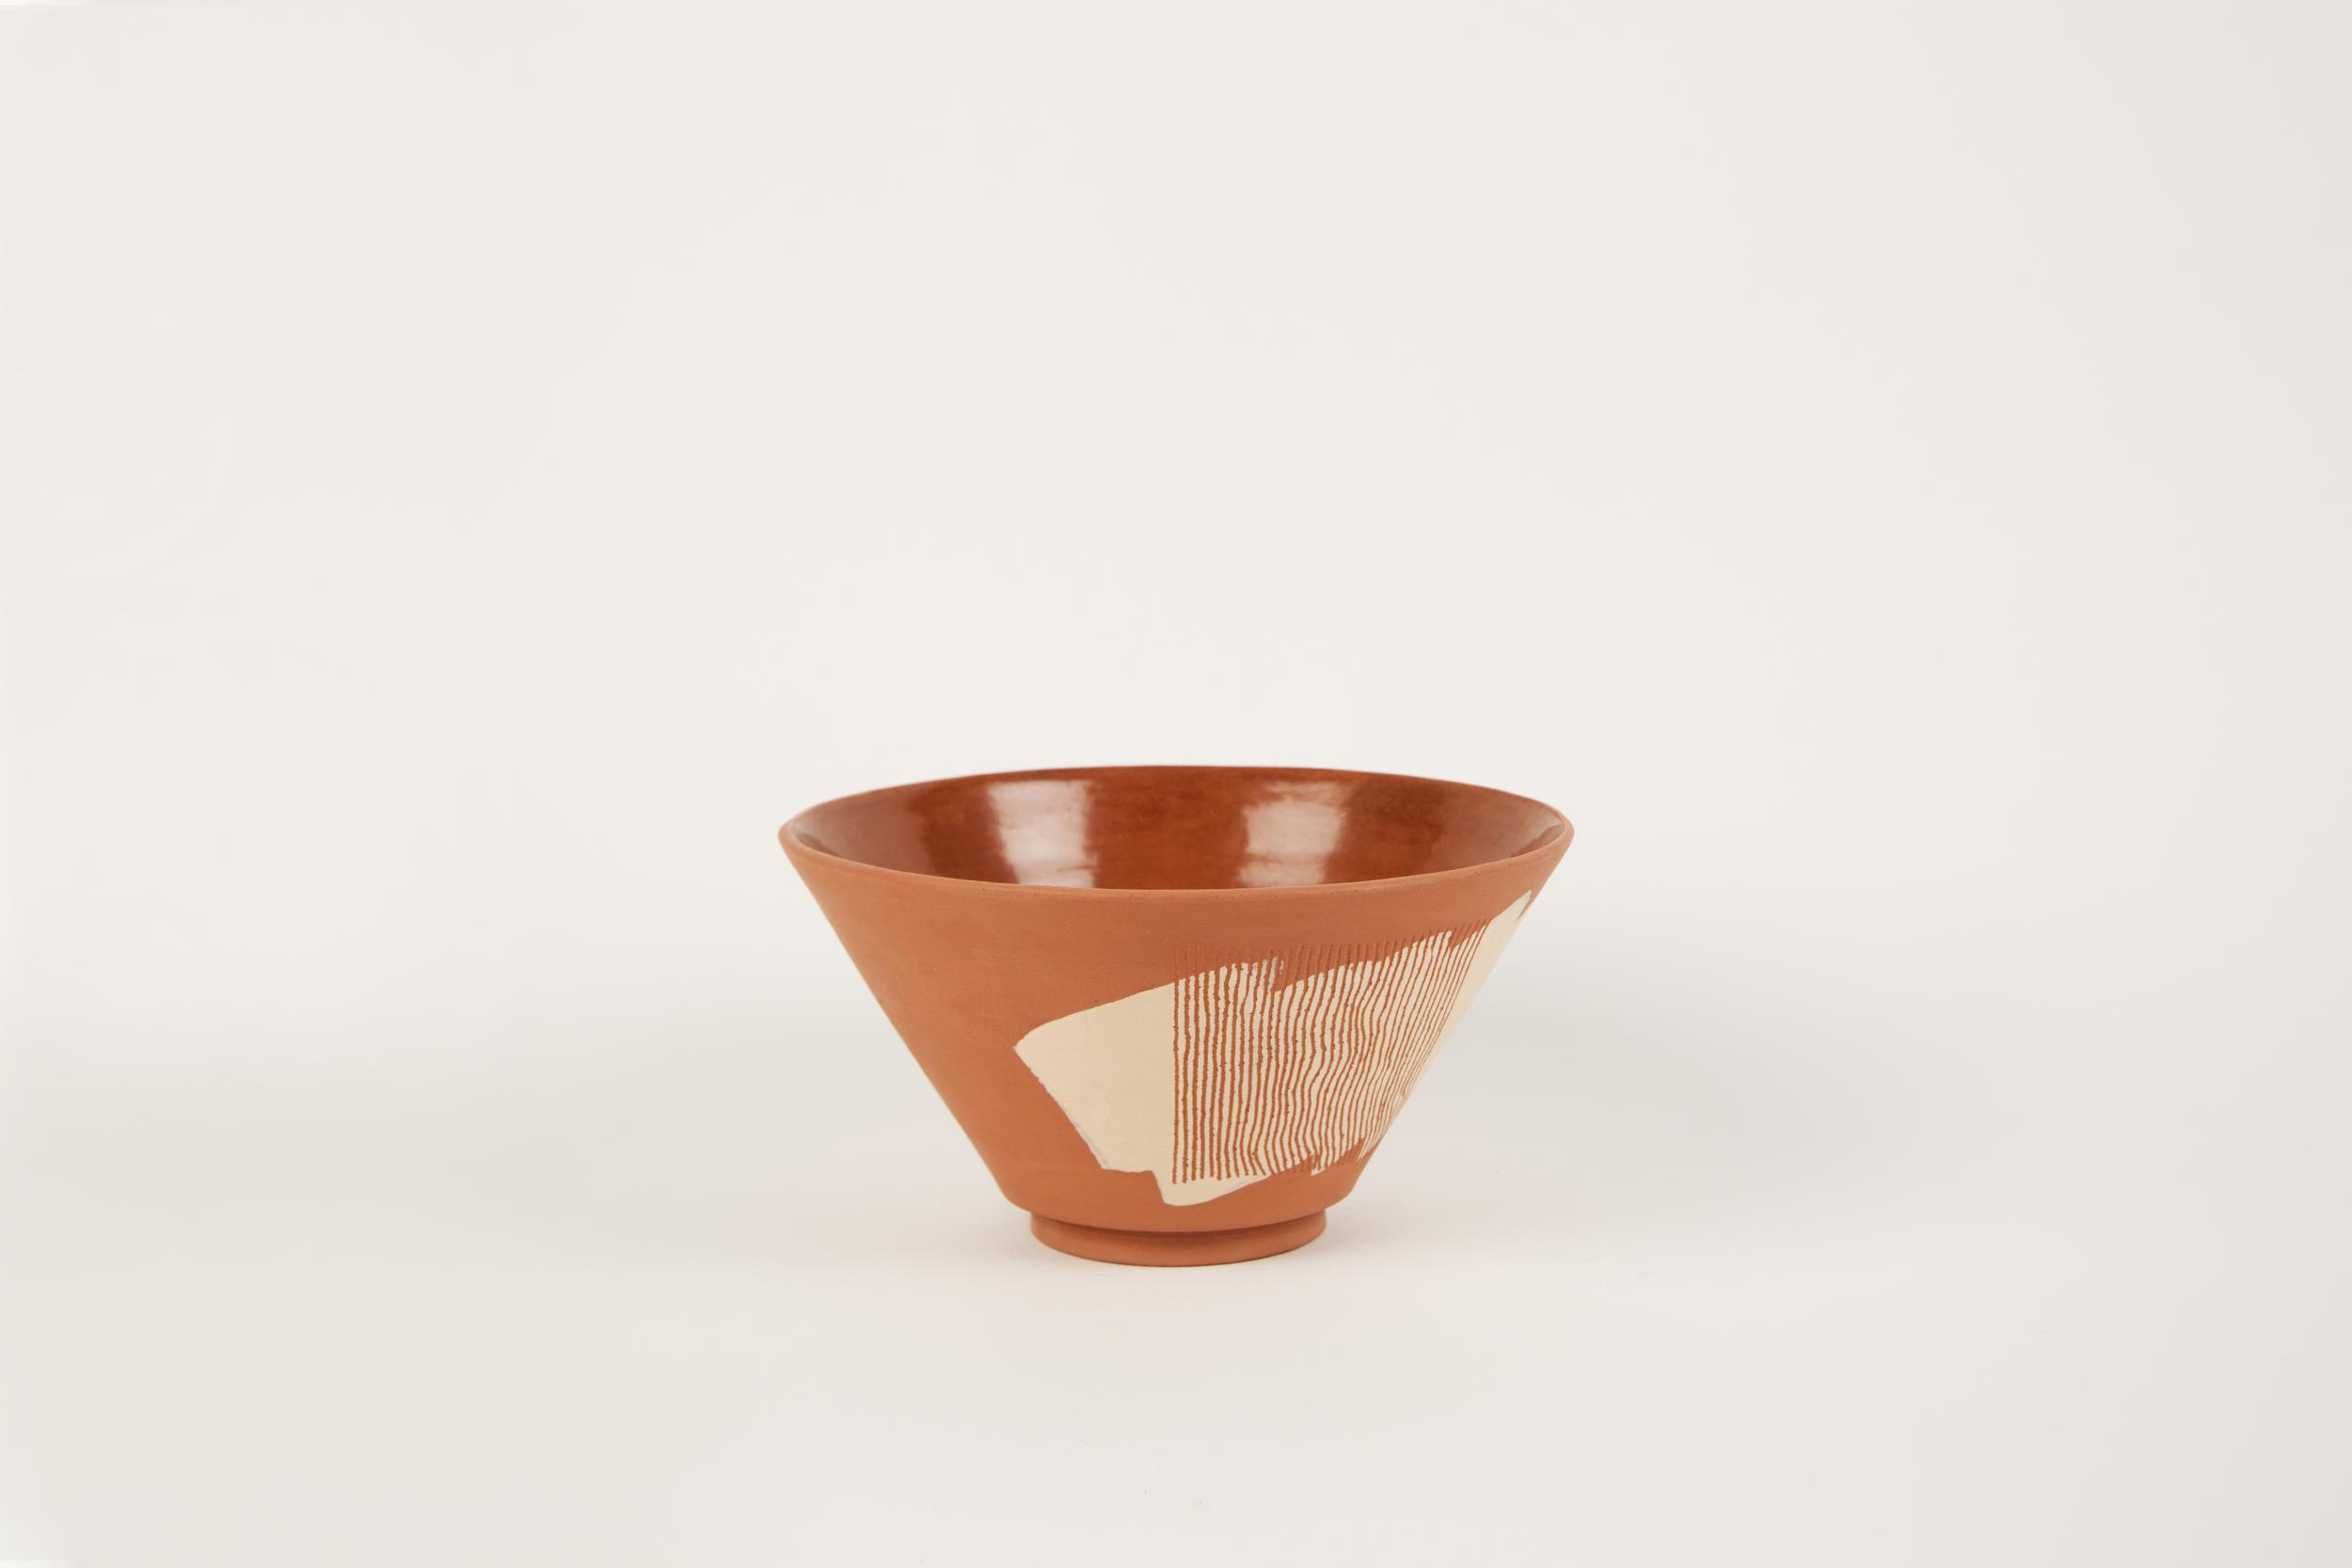 16 ZH Meditative Bowl1.jpg